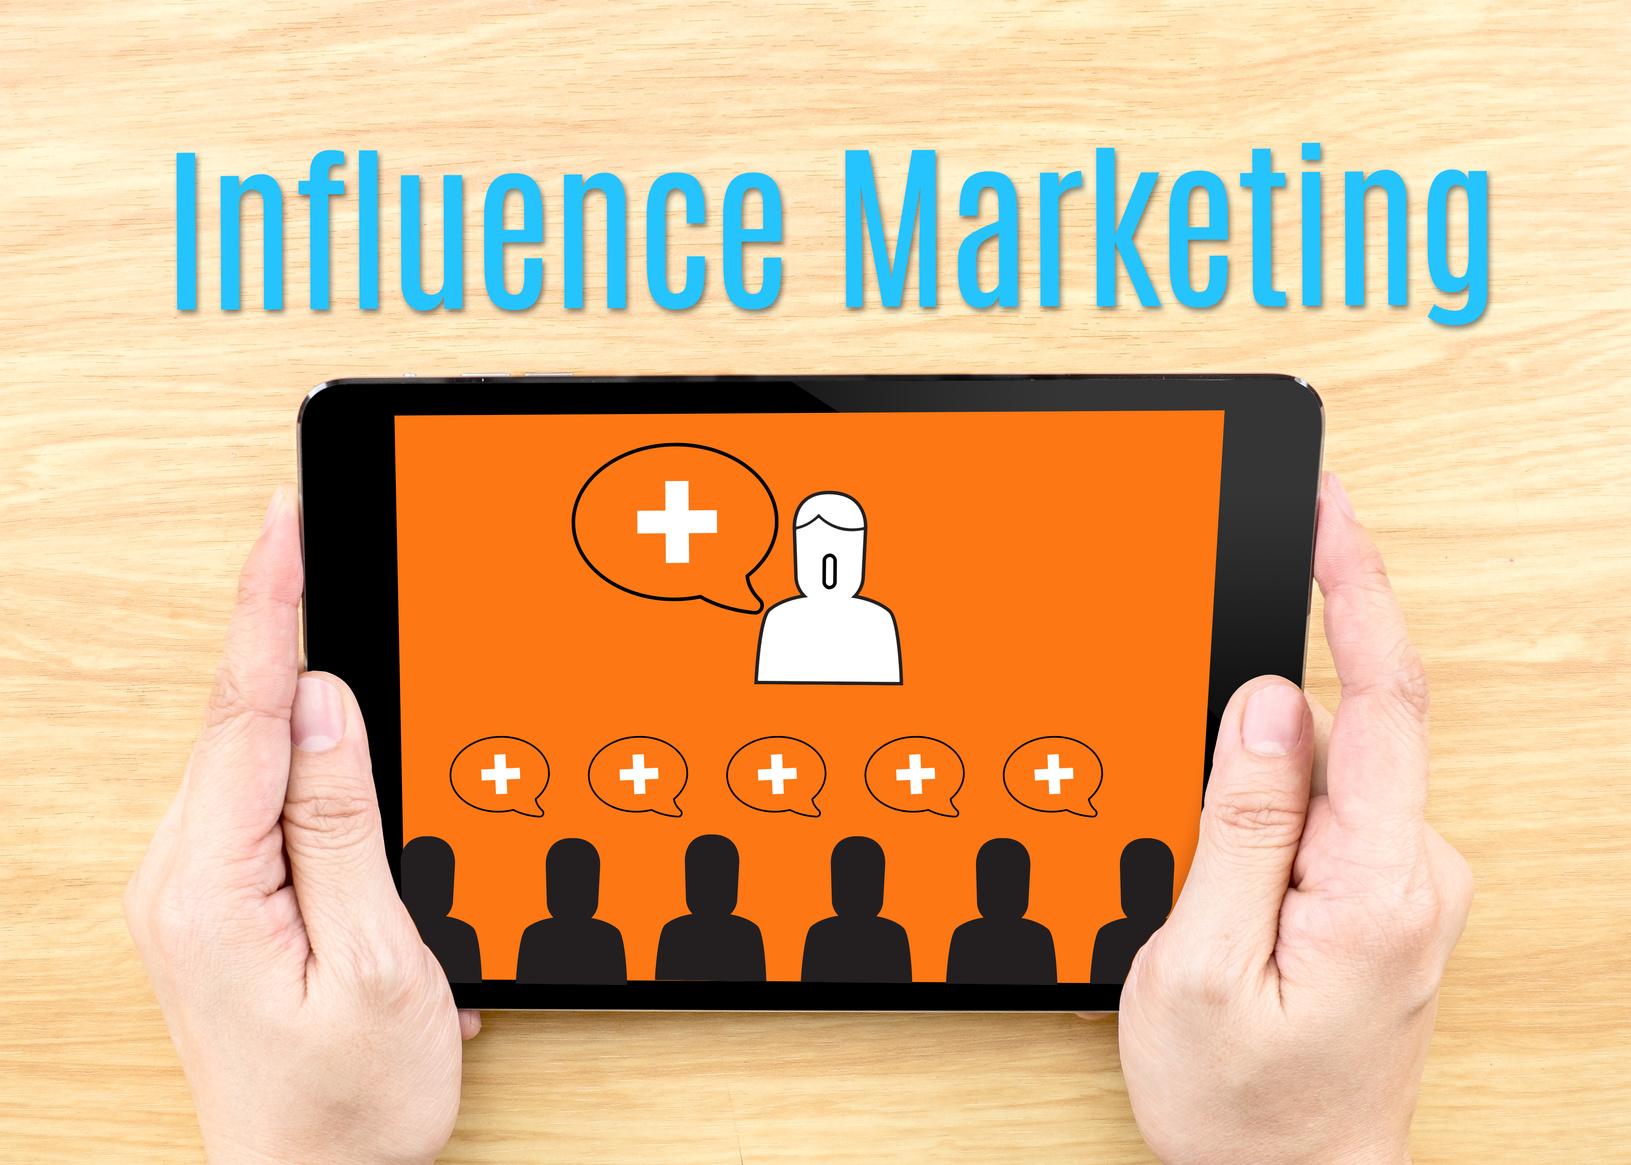 influencer marketing definition strategy 101